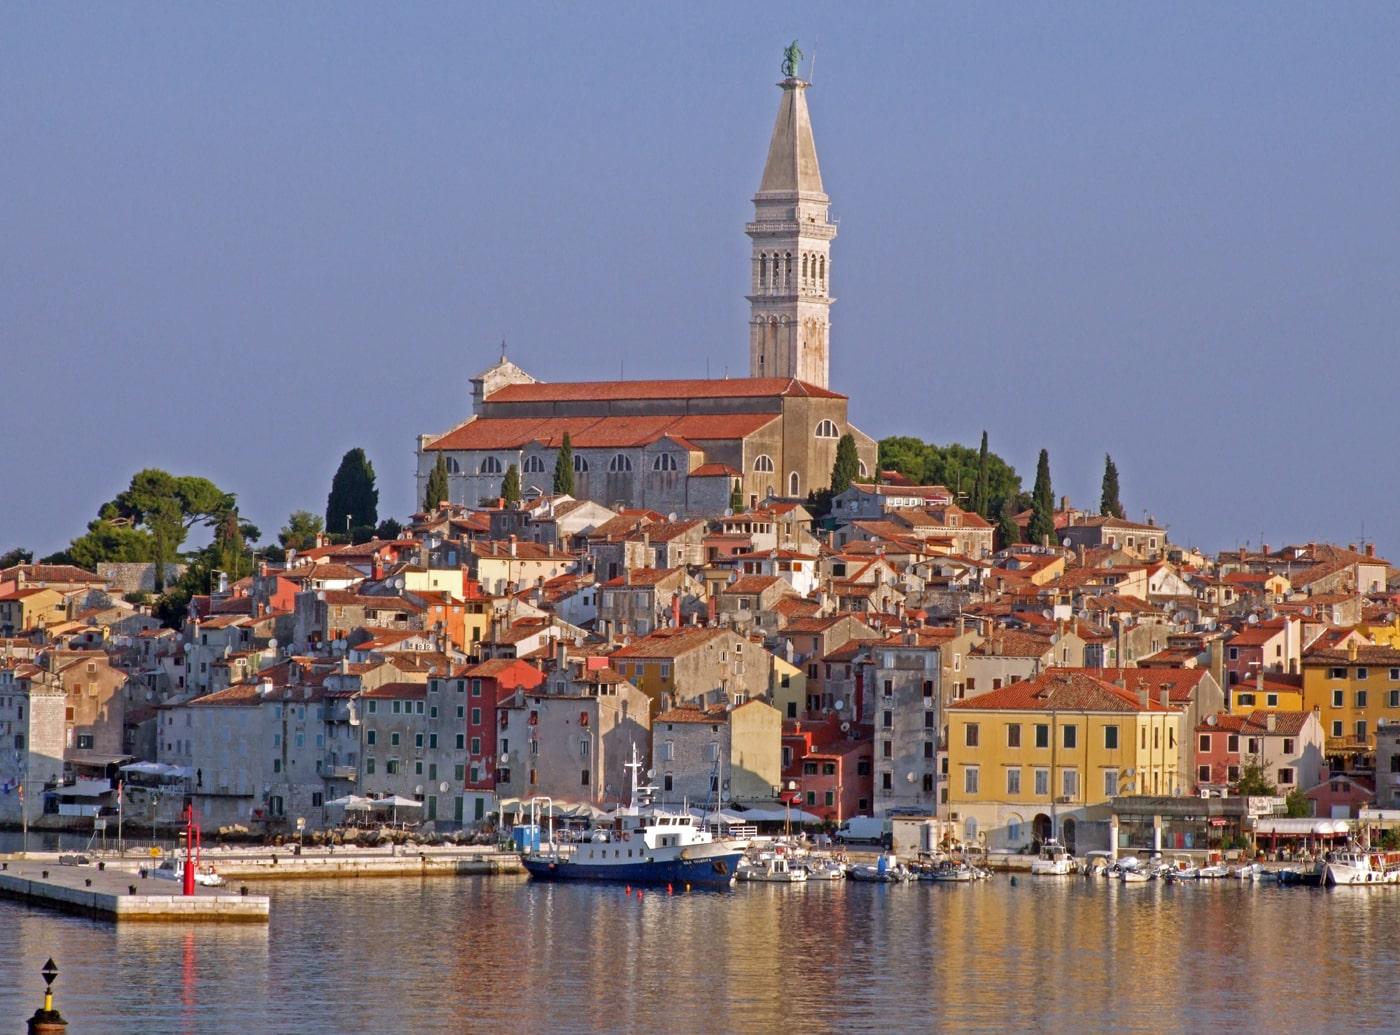 Kroatien, Istrien, Rovinj, Stadtansicht, Kirche Hl. Euphemia (Sveta Eufemija)